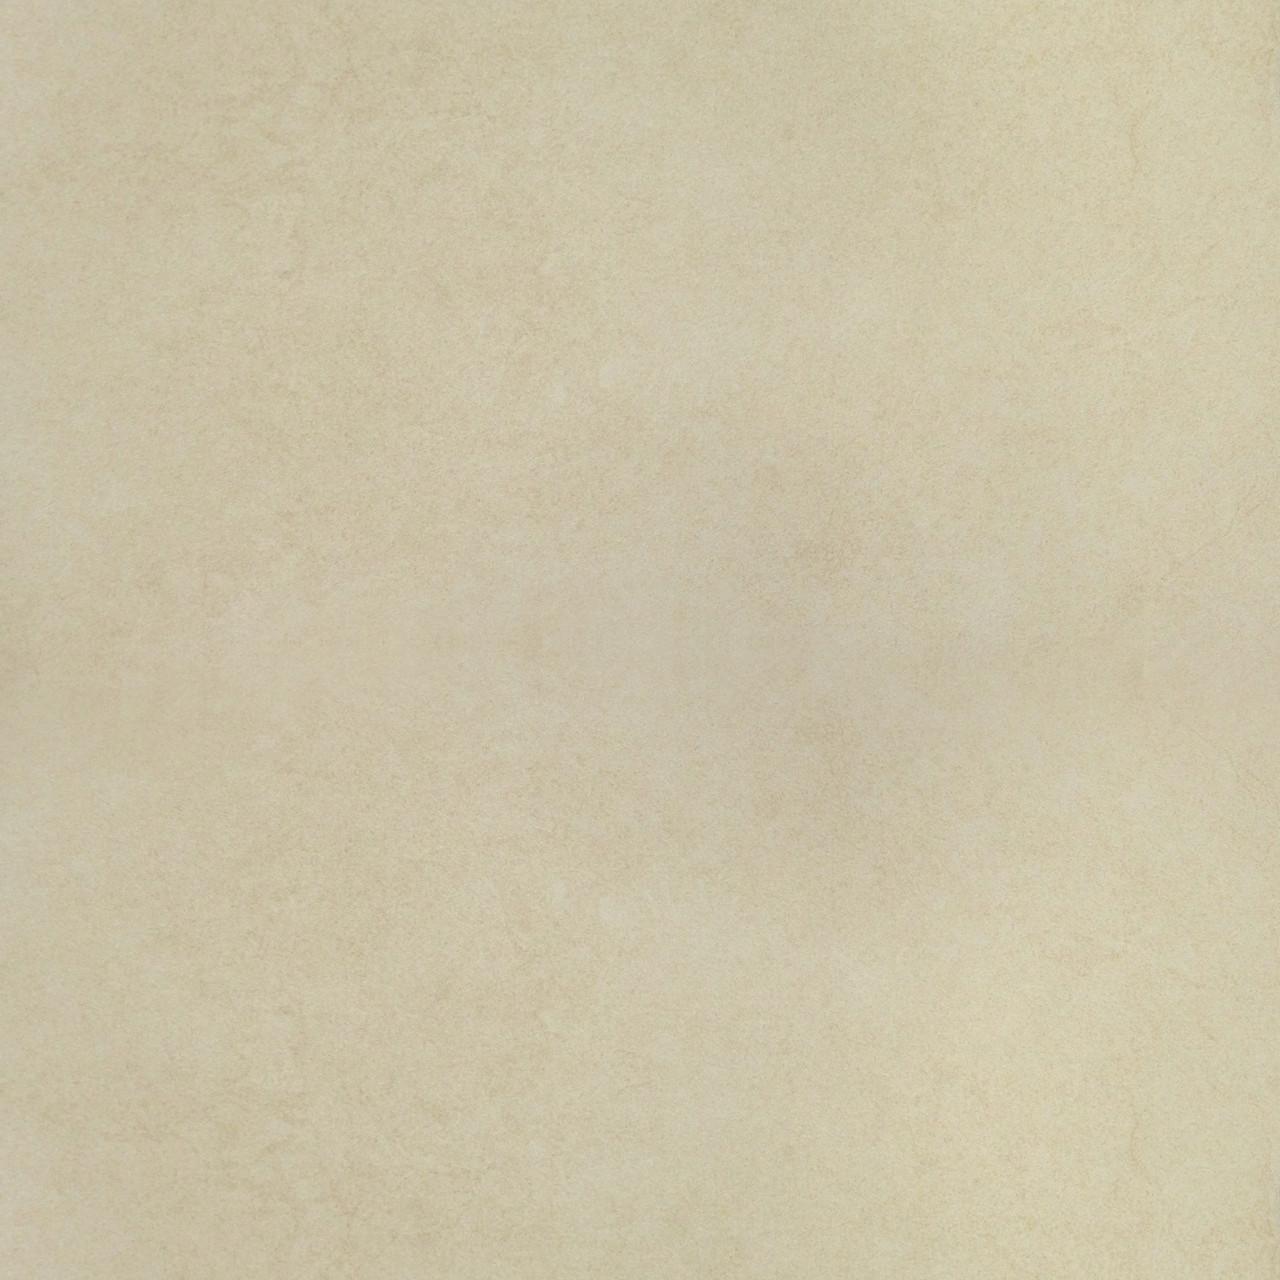 Плитка для пола ректифицированная Arc B 600x600 /4 P